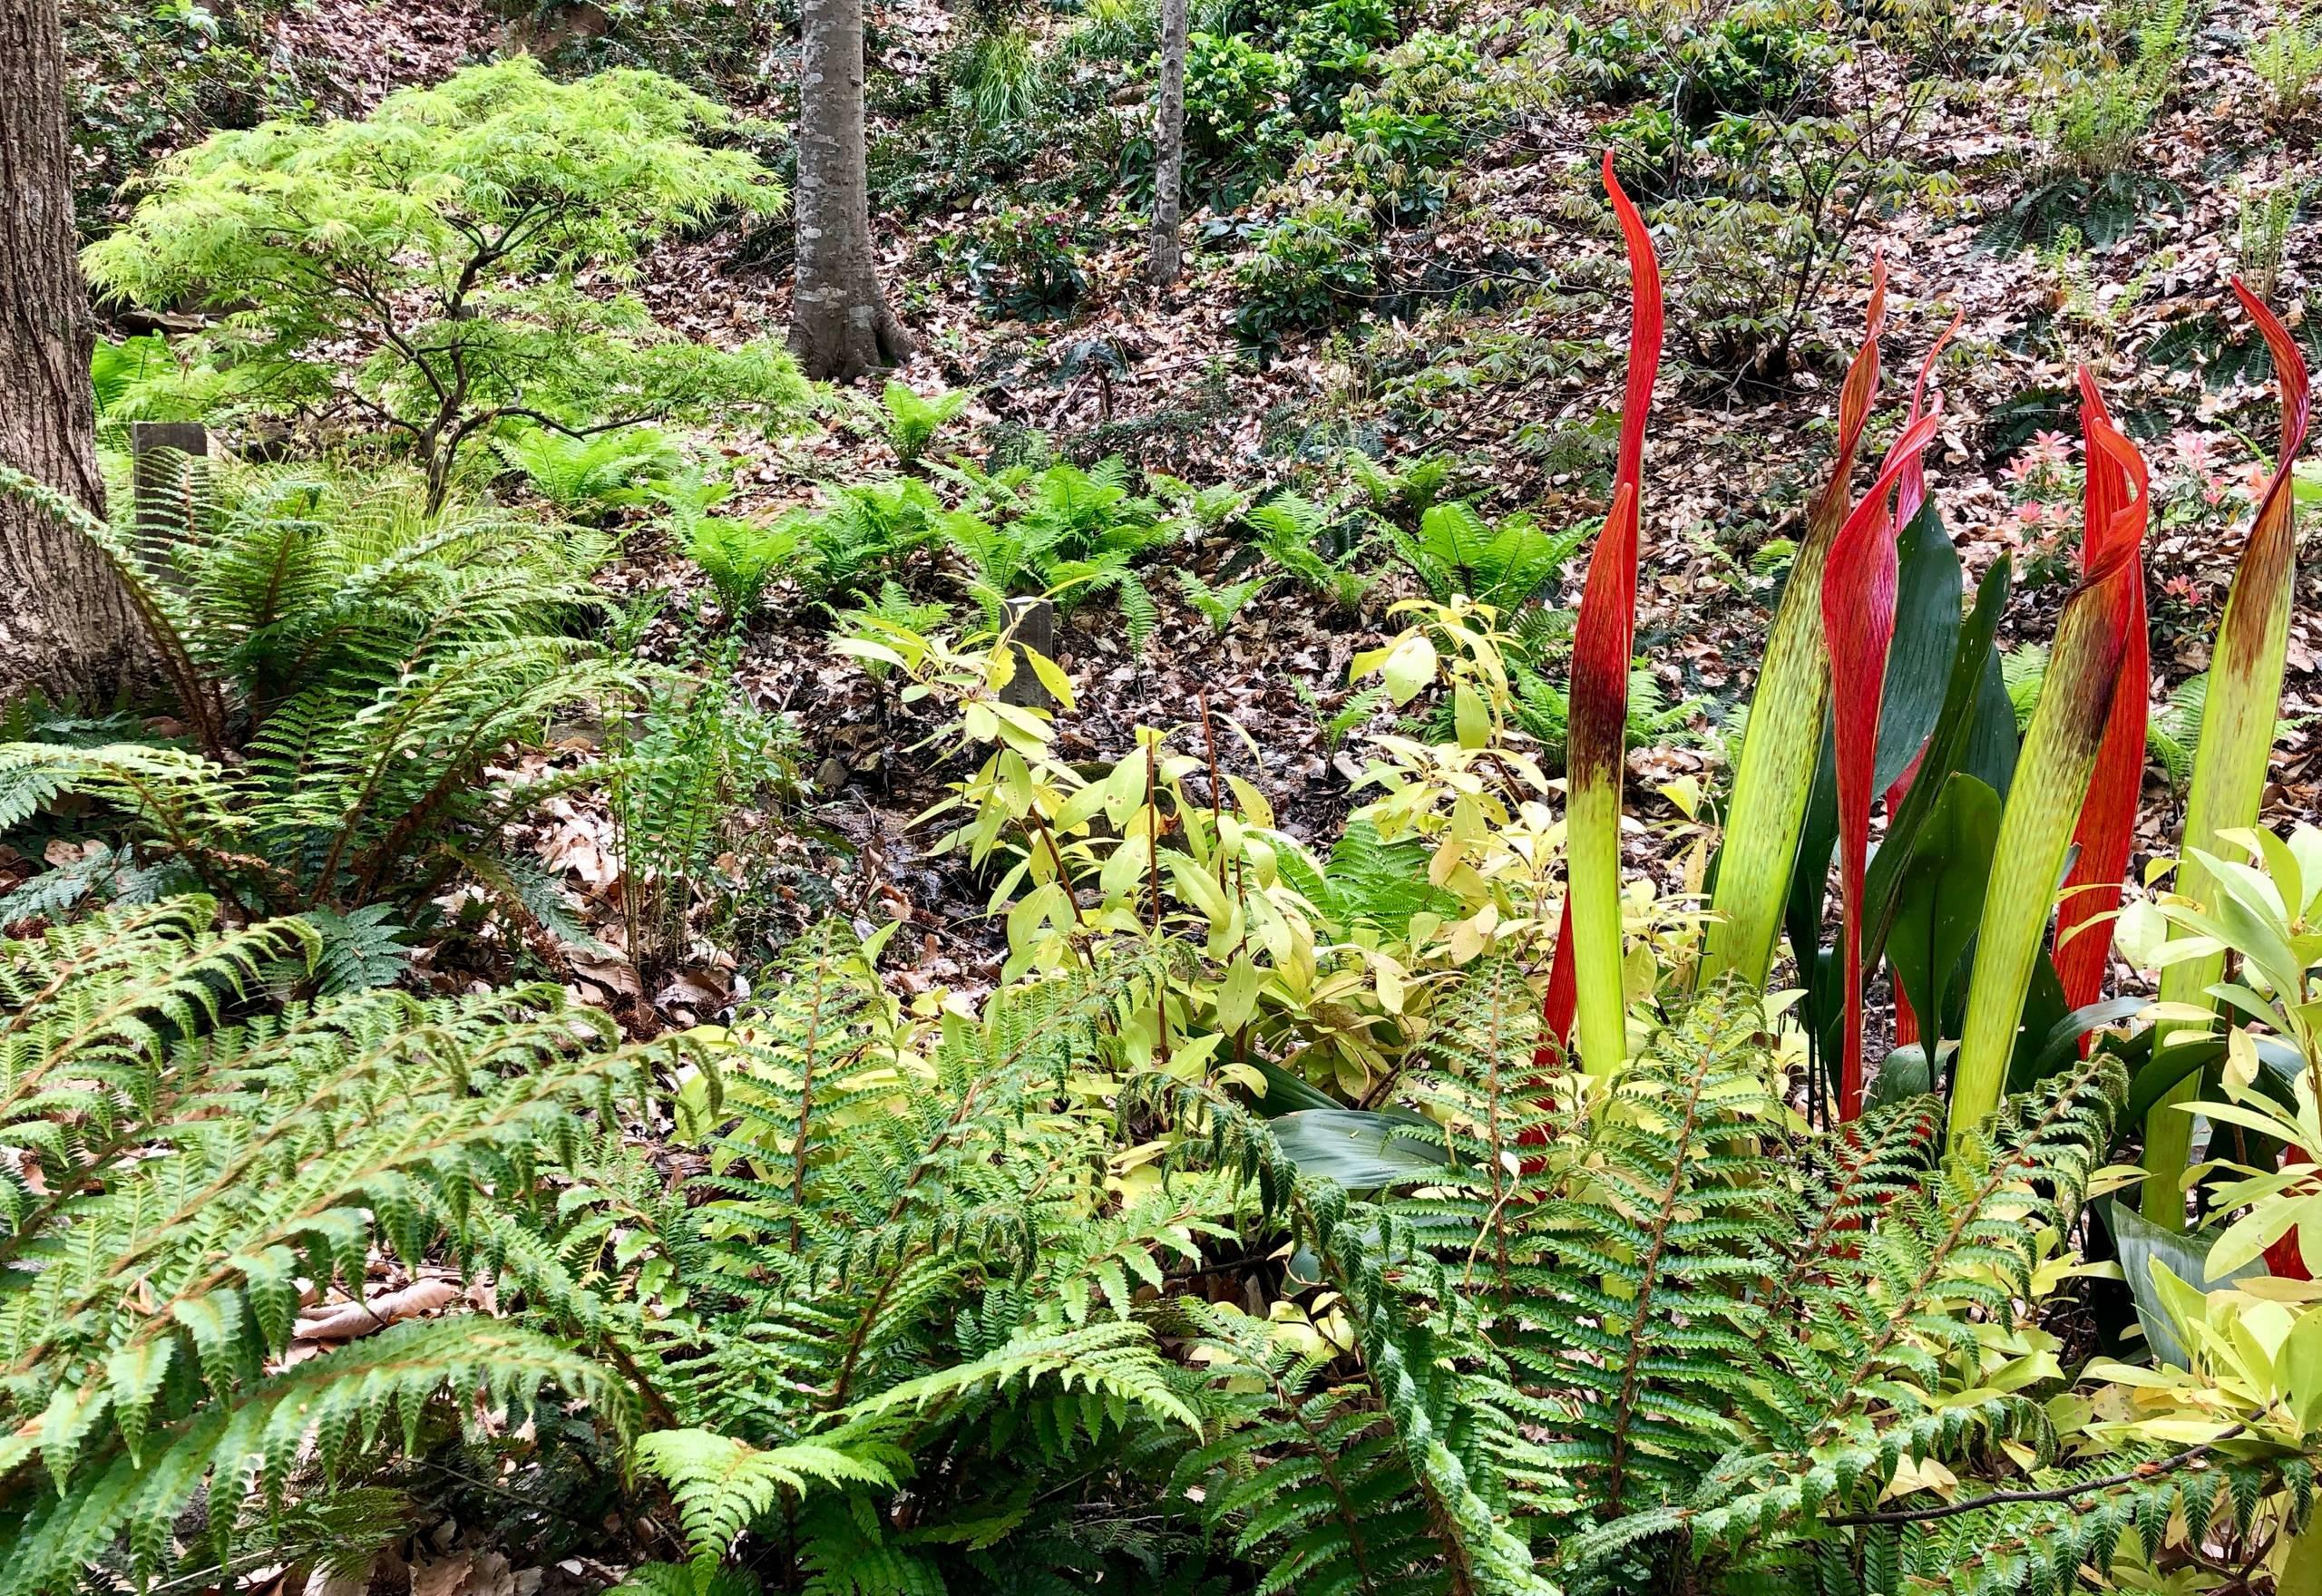 Spring 2019 in the fern glen.